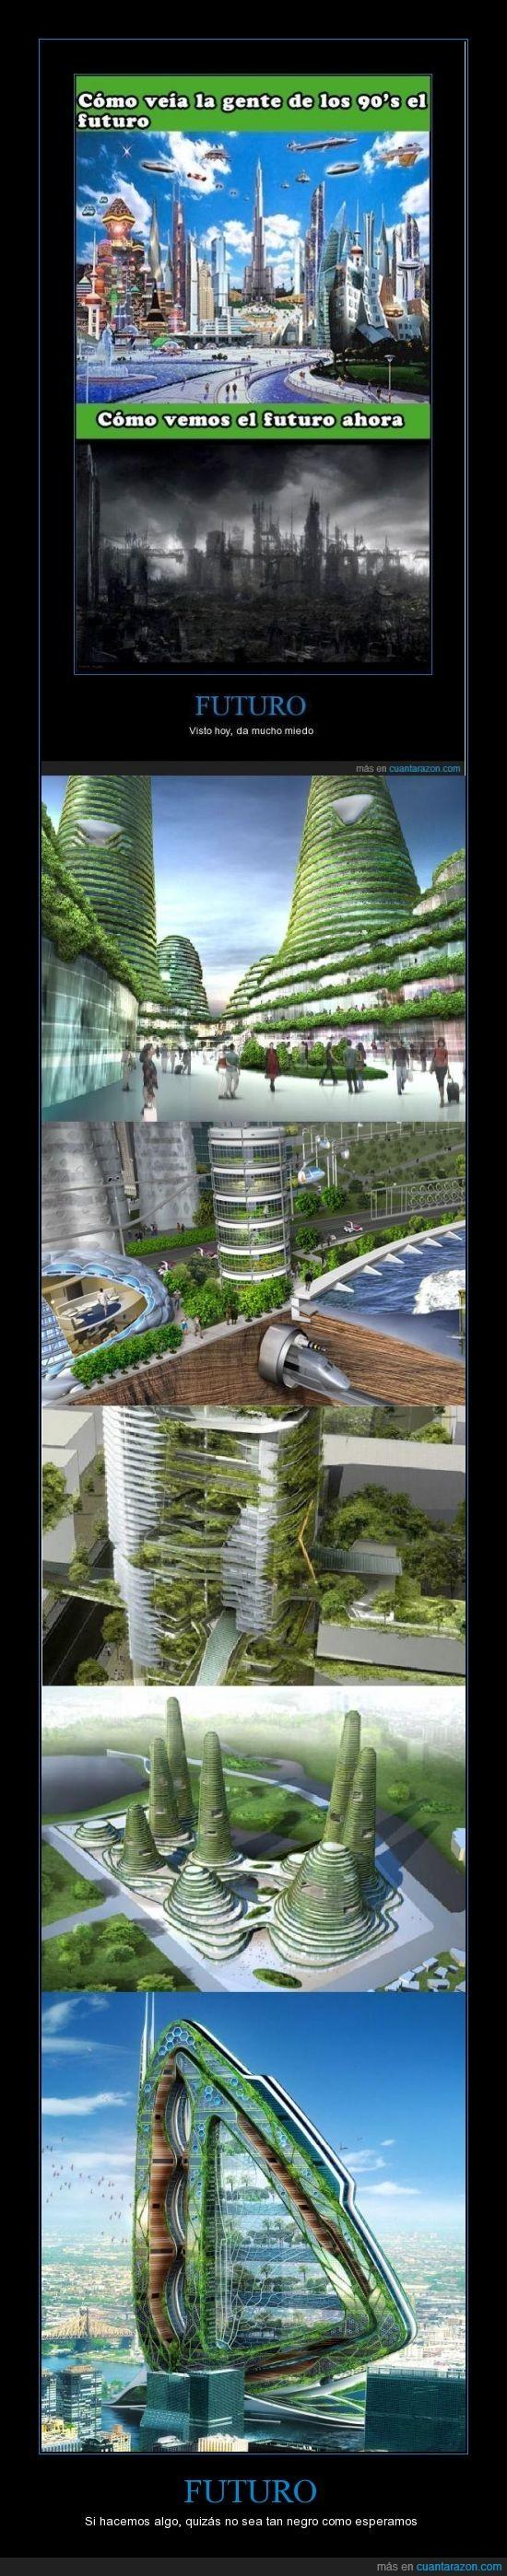 arboles,ecologia,futuro,humanidad,planta,union,verde